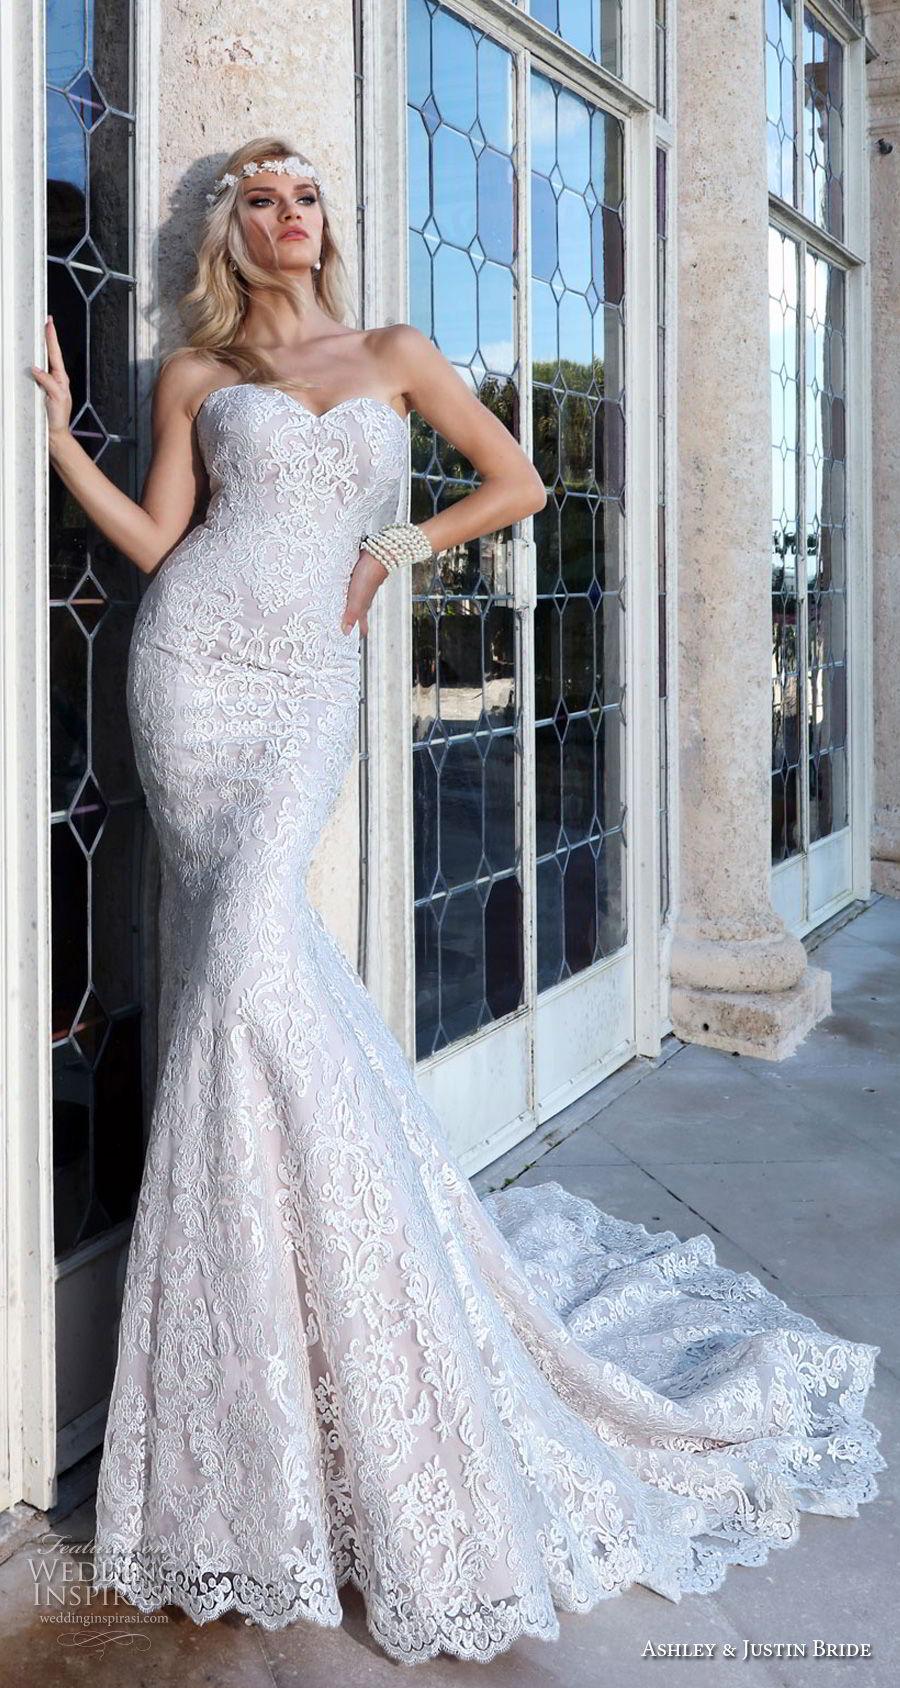 ashley justin spring 2018 bridal strapless sweetheart neckline full embellishment elegant romantic fit and flare wedding dress open back chapel train (10) mv